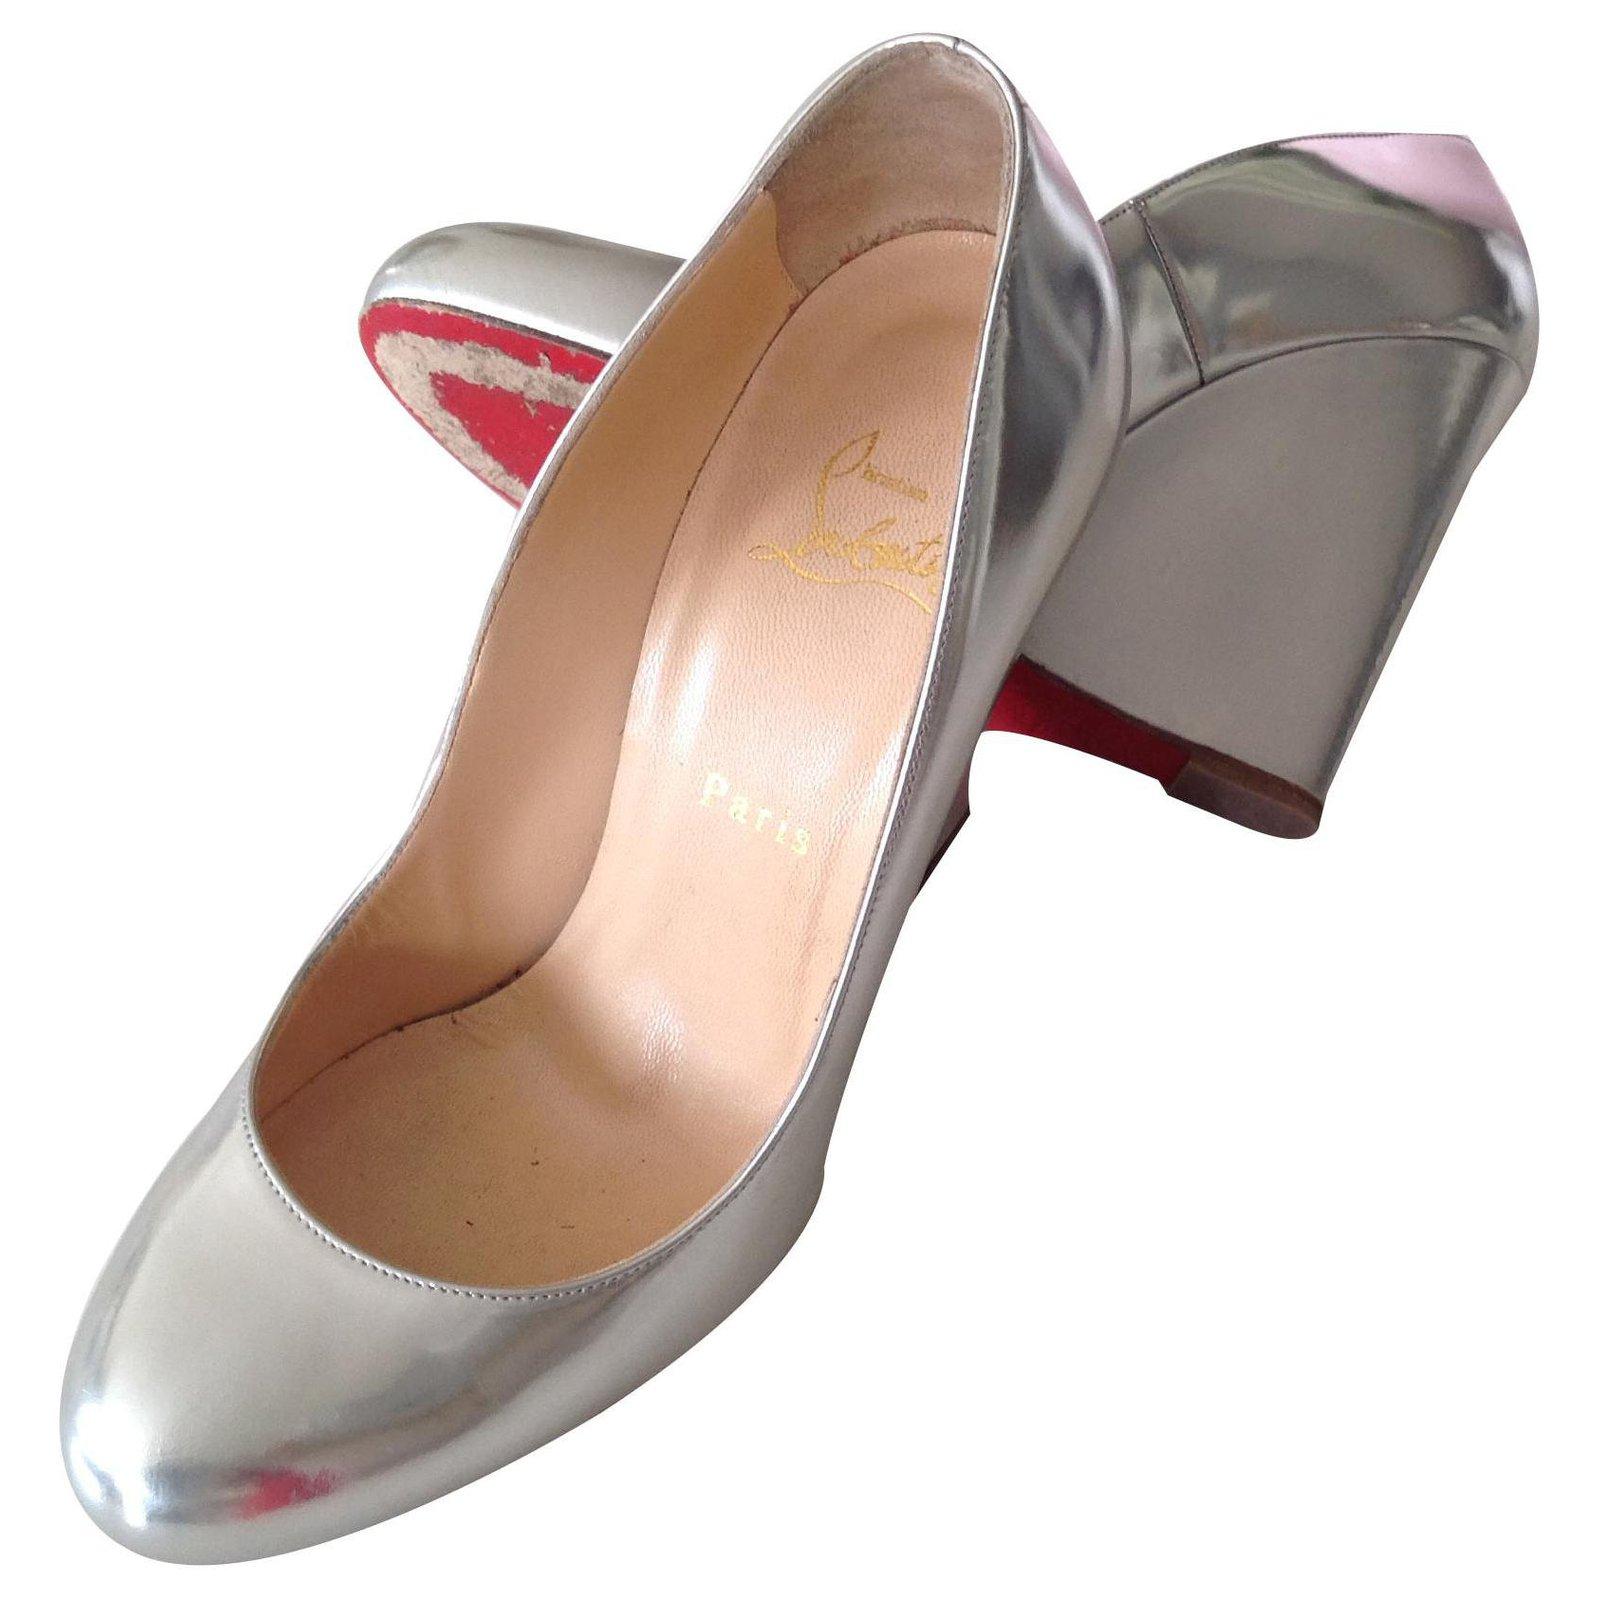 cheap for discount e1457 98927 Wedge Heel Pump.